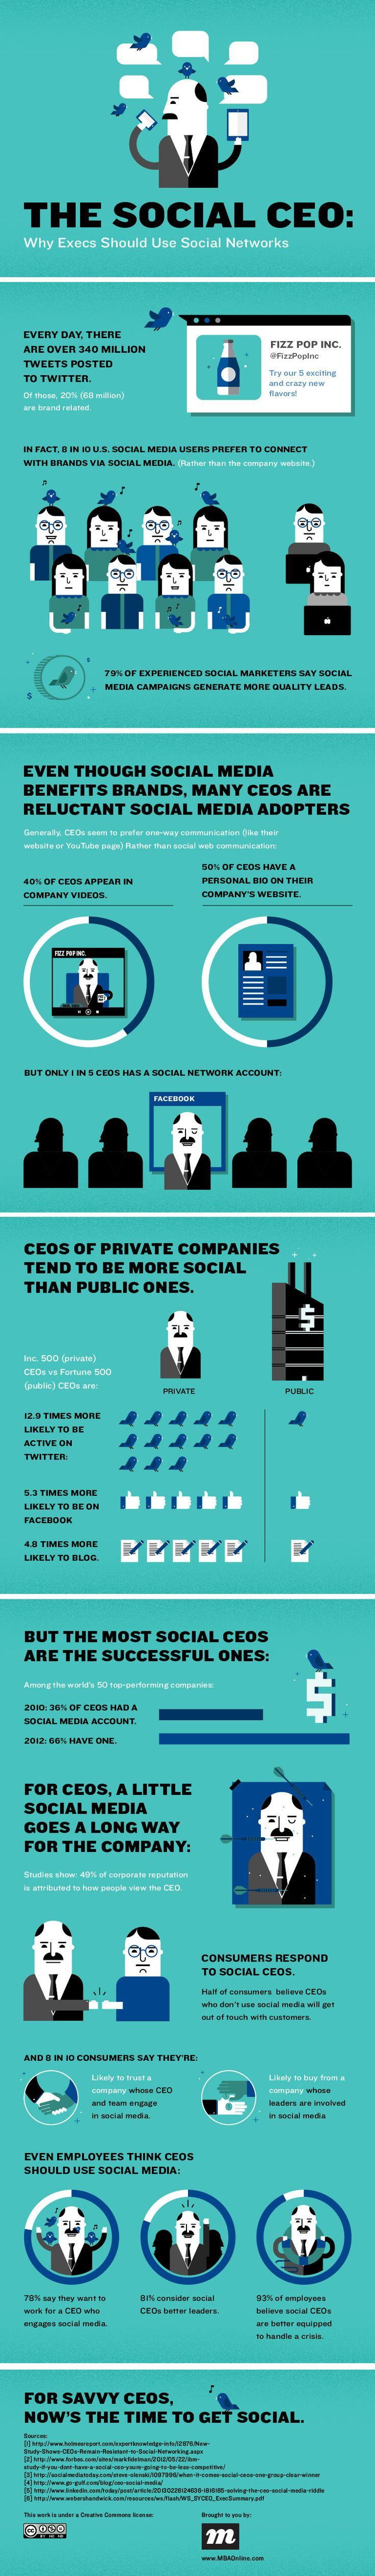 Why CEO should use social media